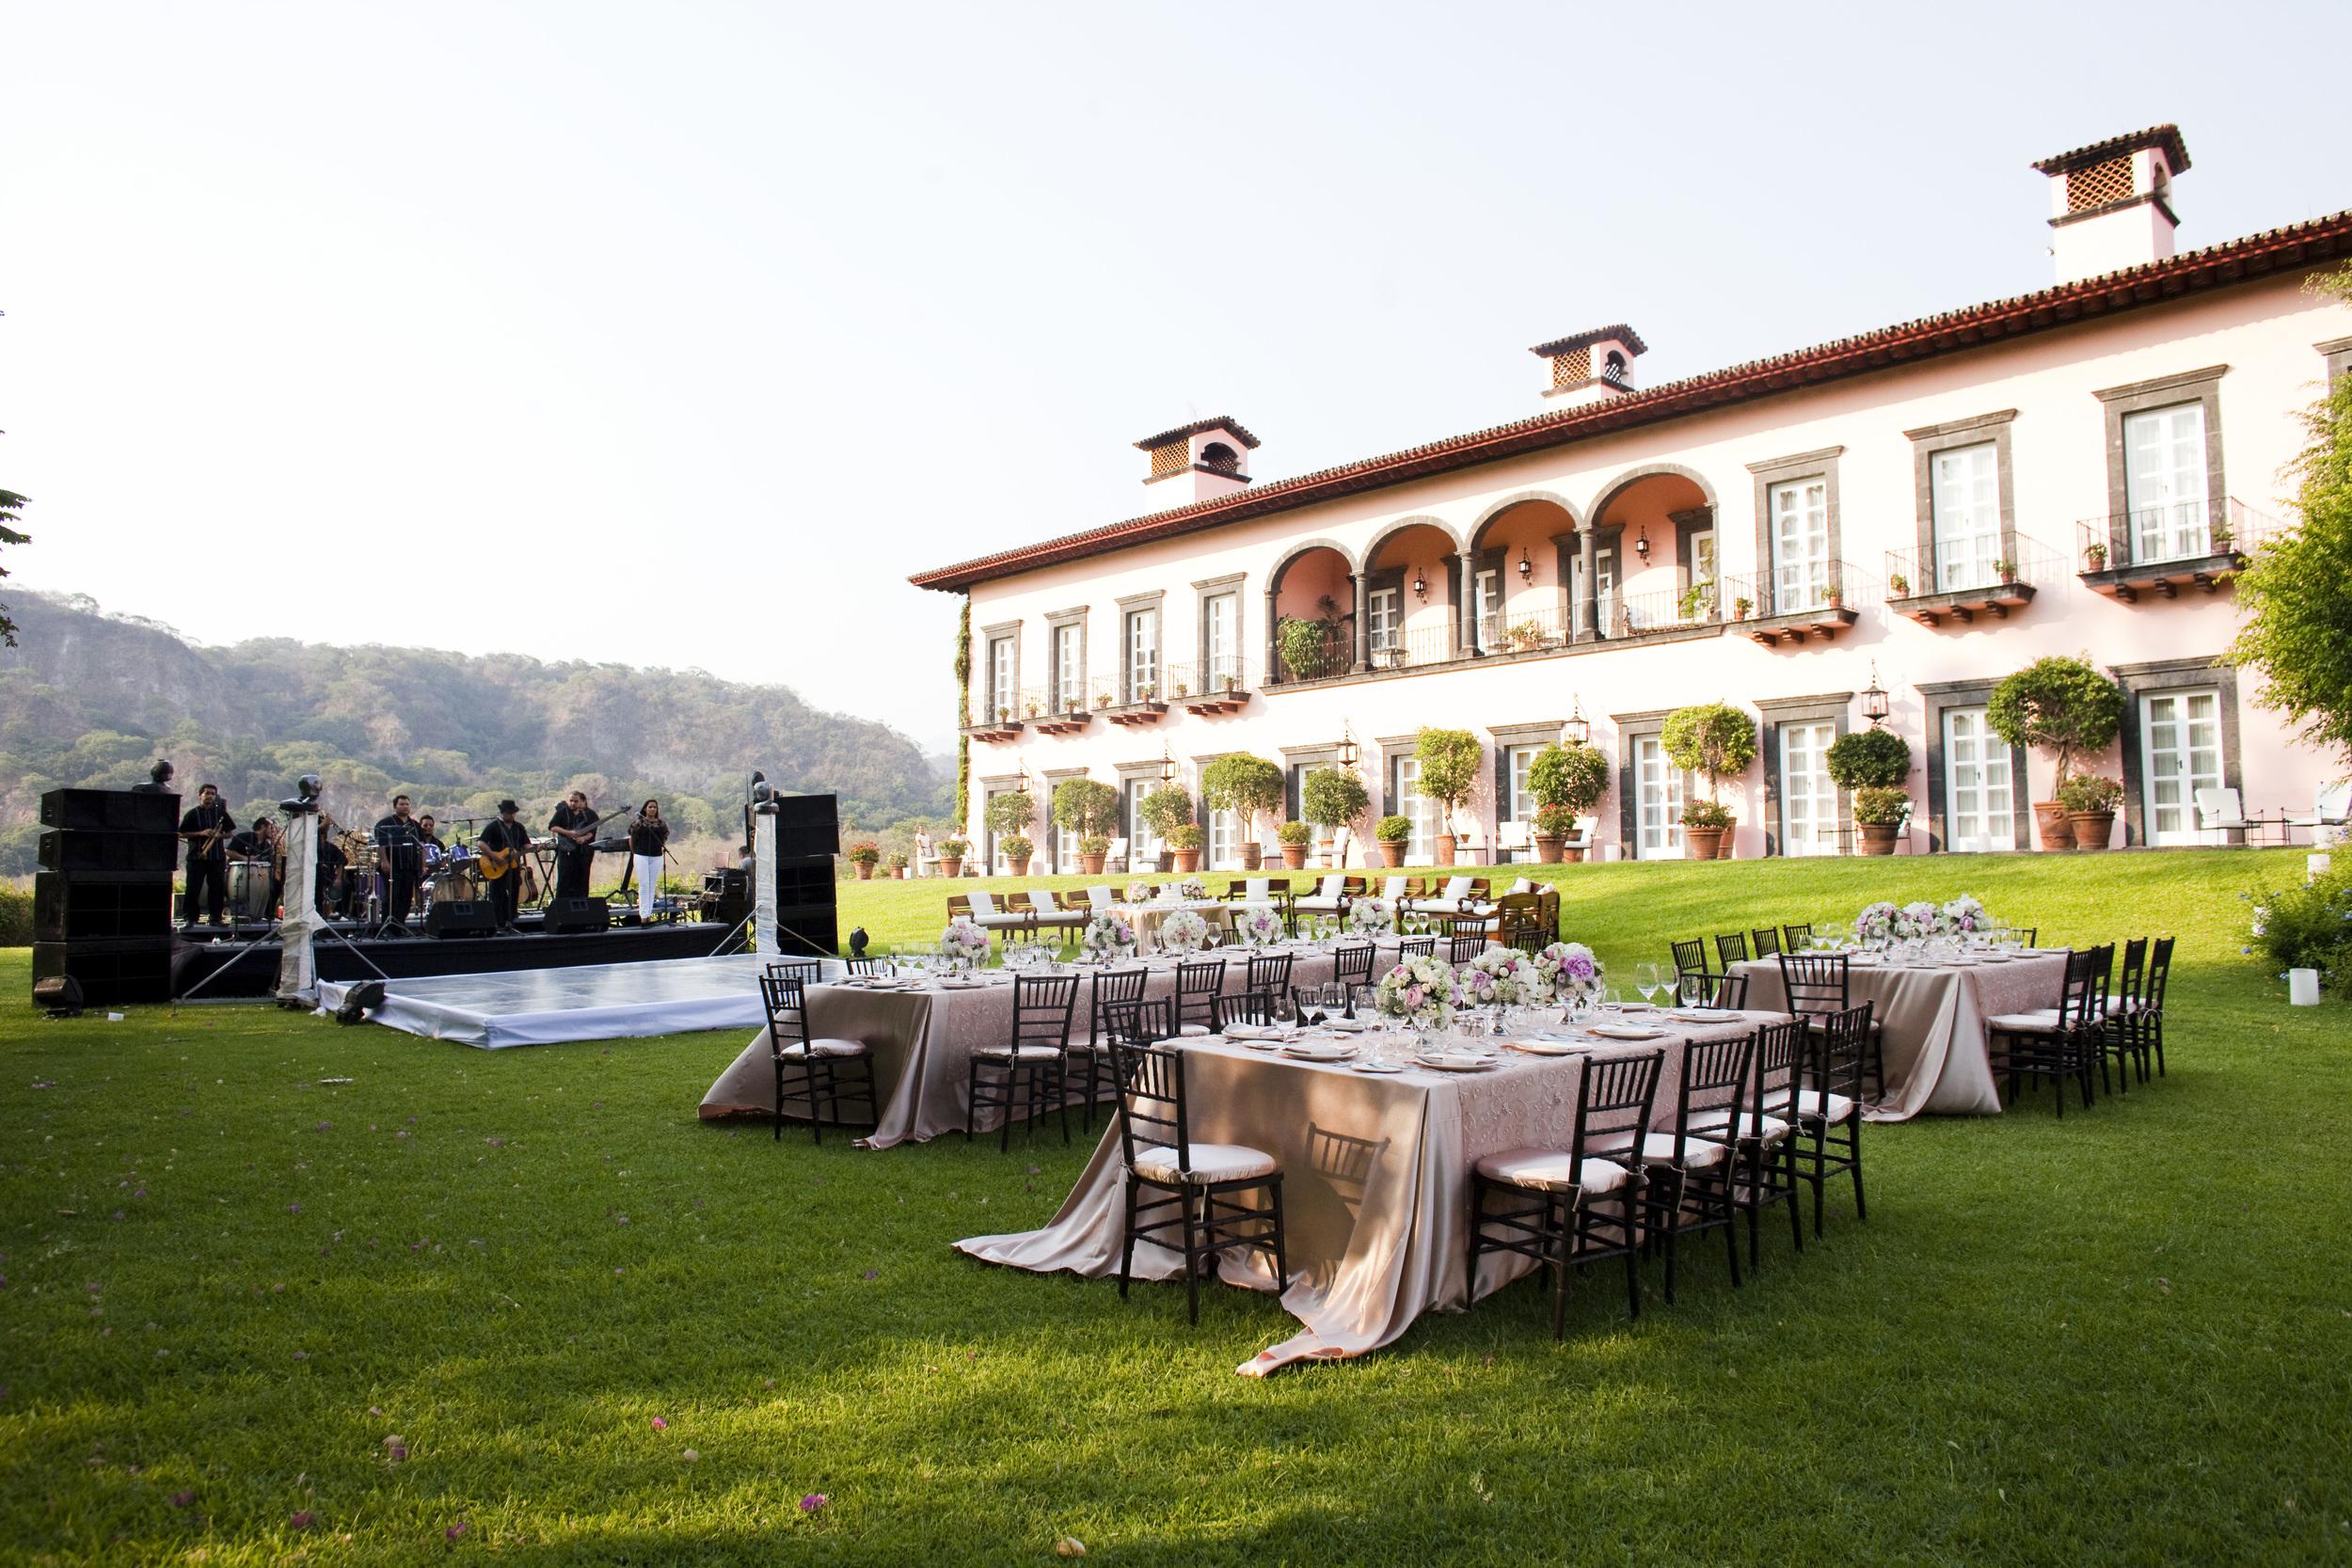 Ceci_New_York_Style_Luxury_Custom_Mexico_Wedding_CeciBride_Letterpress_NewYork_Foil_Hacienda_de_San_Antonio_39.jpg